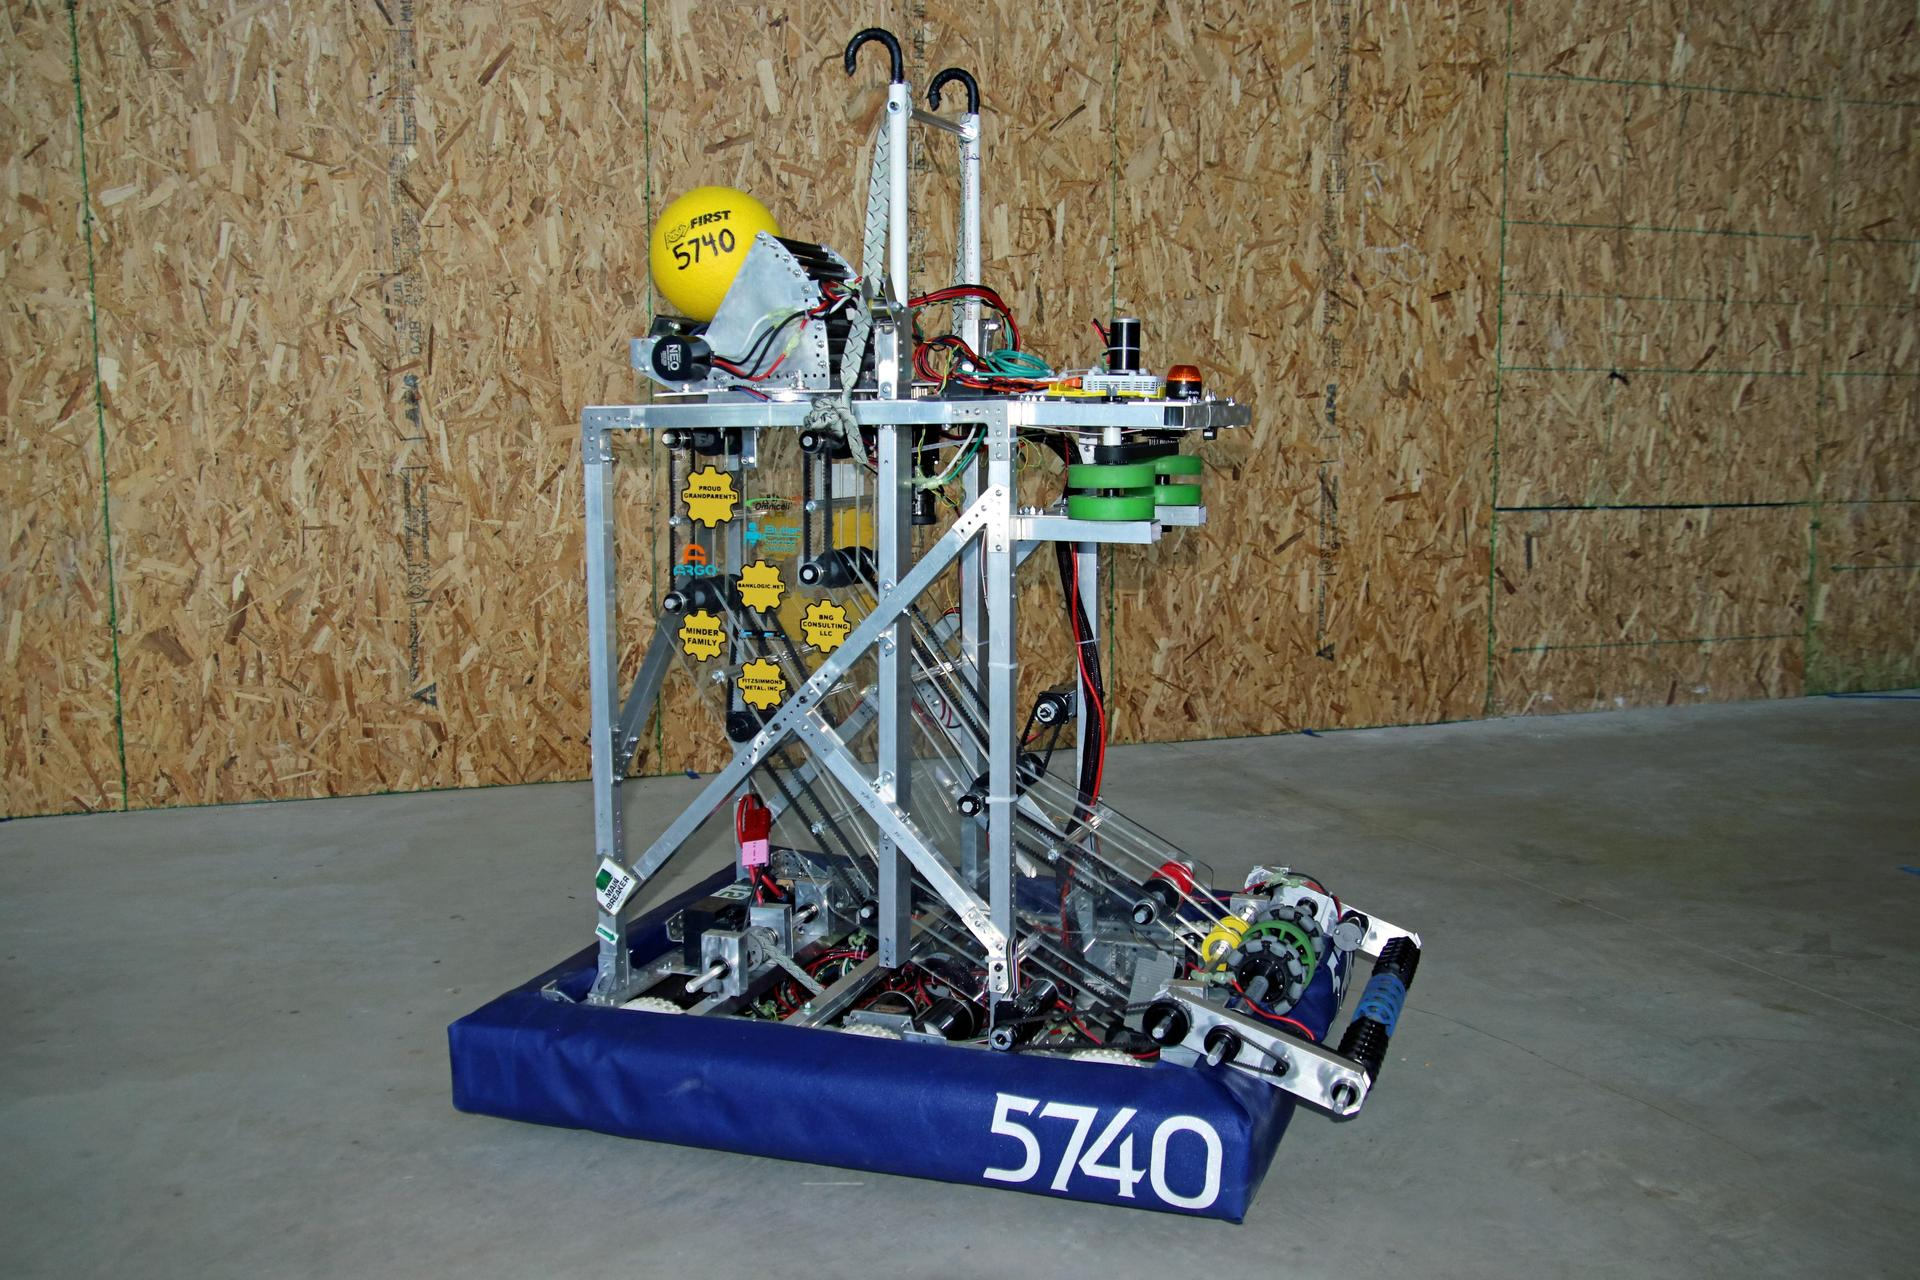 North Catholic Robotics STEM Program